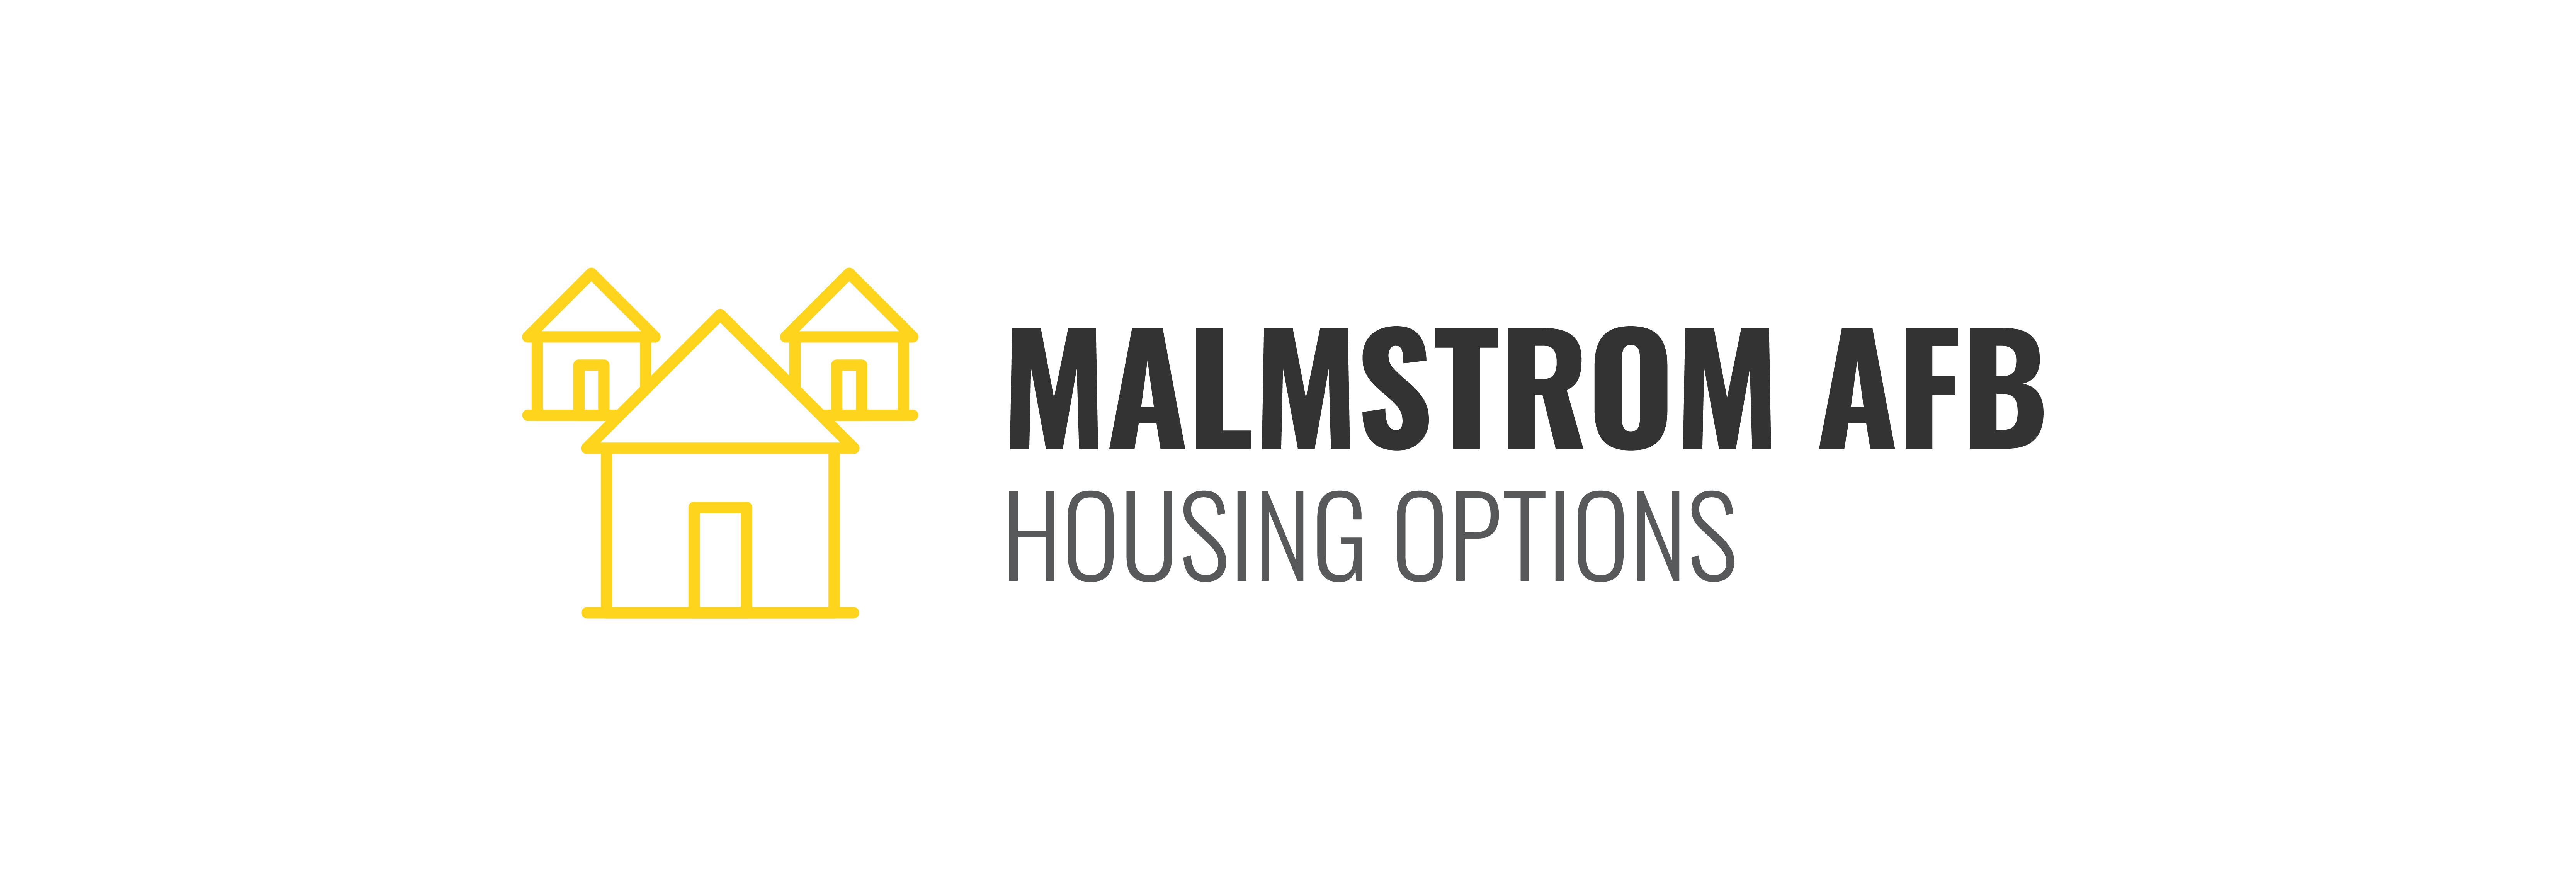 Malmstrom AFB Housing Options